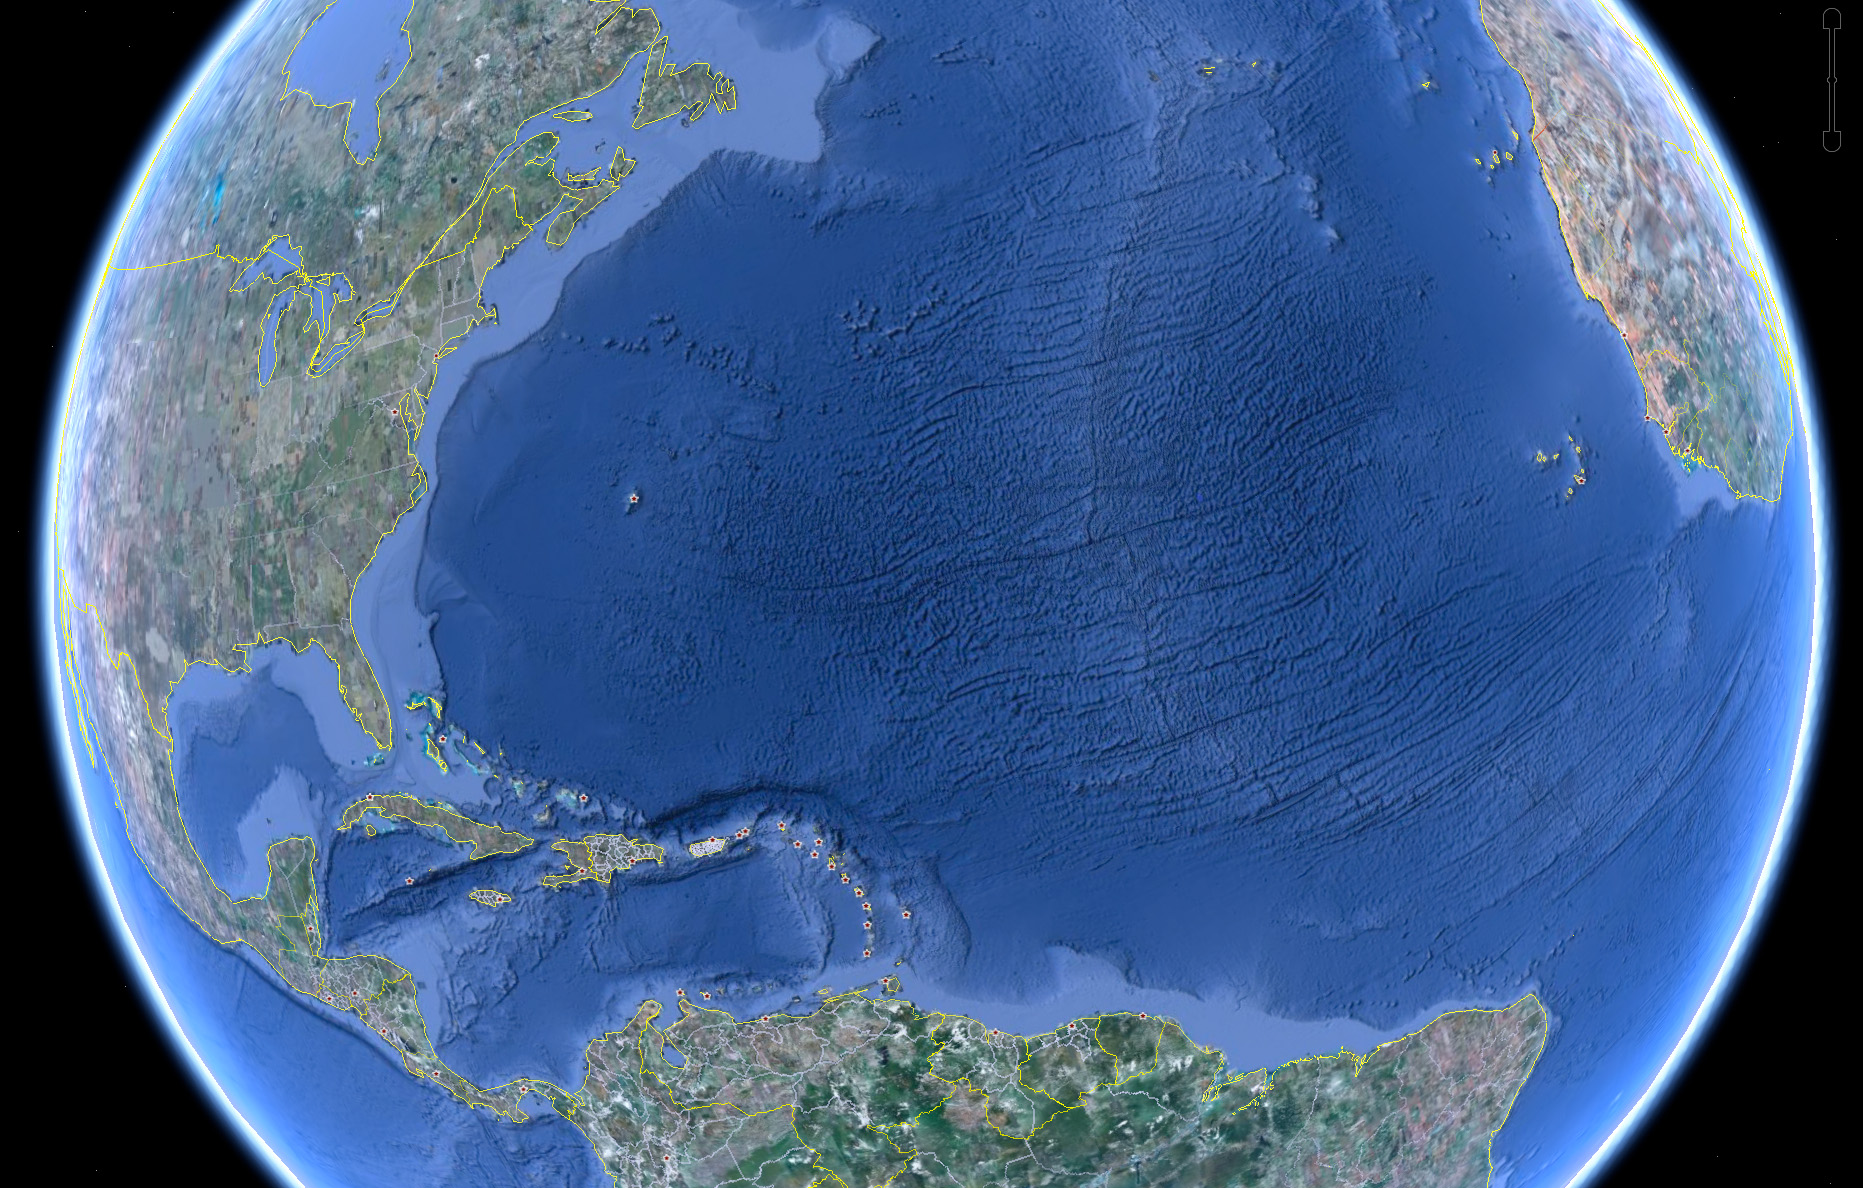 Newport Beach Local News Google Earth Watches the Oceans ...